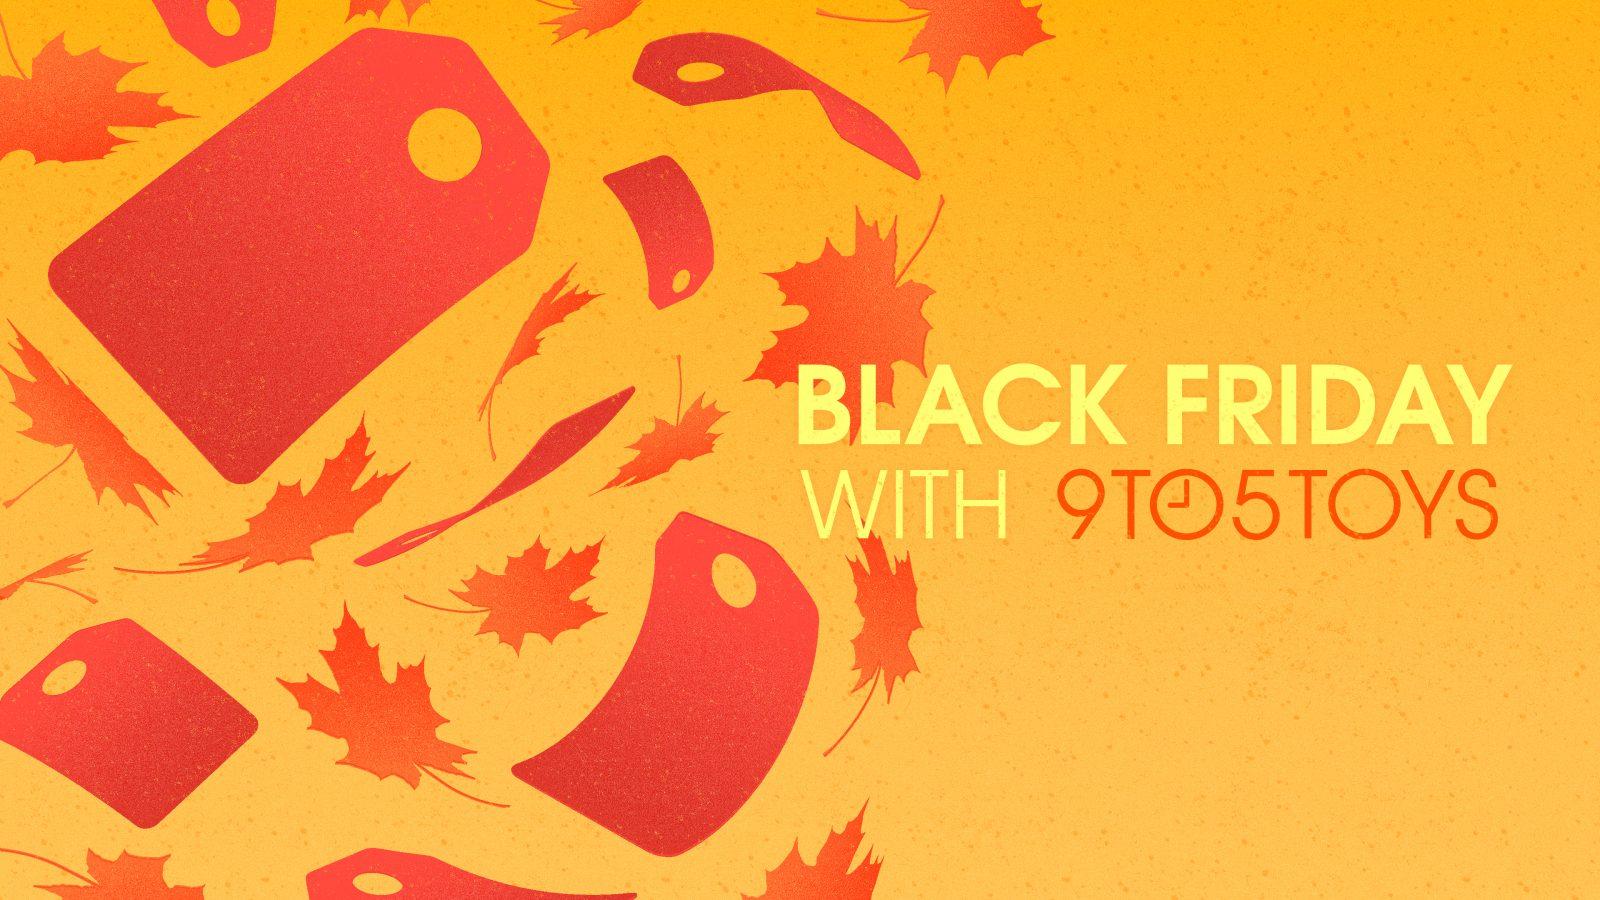 Best Black Friday Deals: Apple, HomeKit tech, TVs, and more [Update: Most deals now live!]